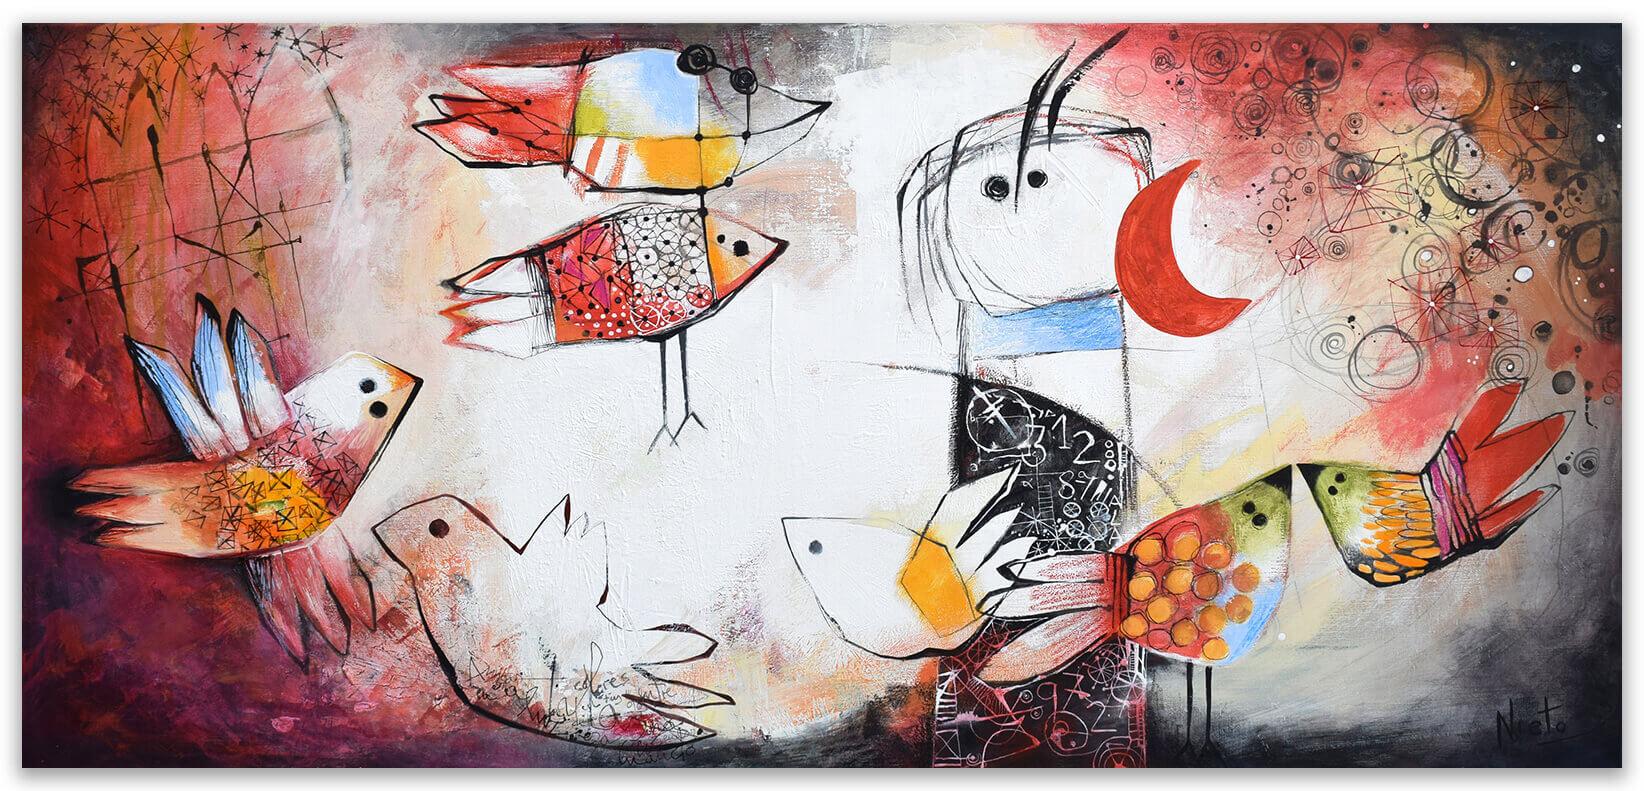 Rodeado de soles - original painting on canvas by Angeles Nieto